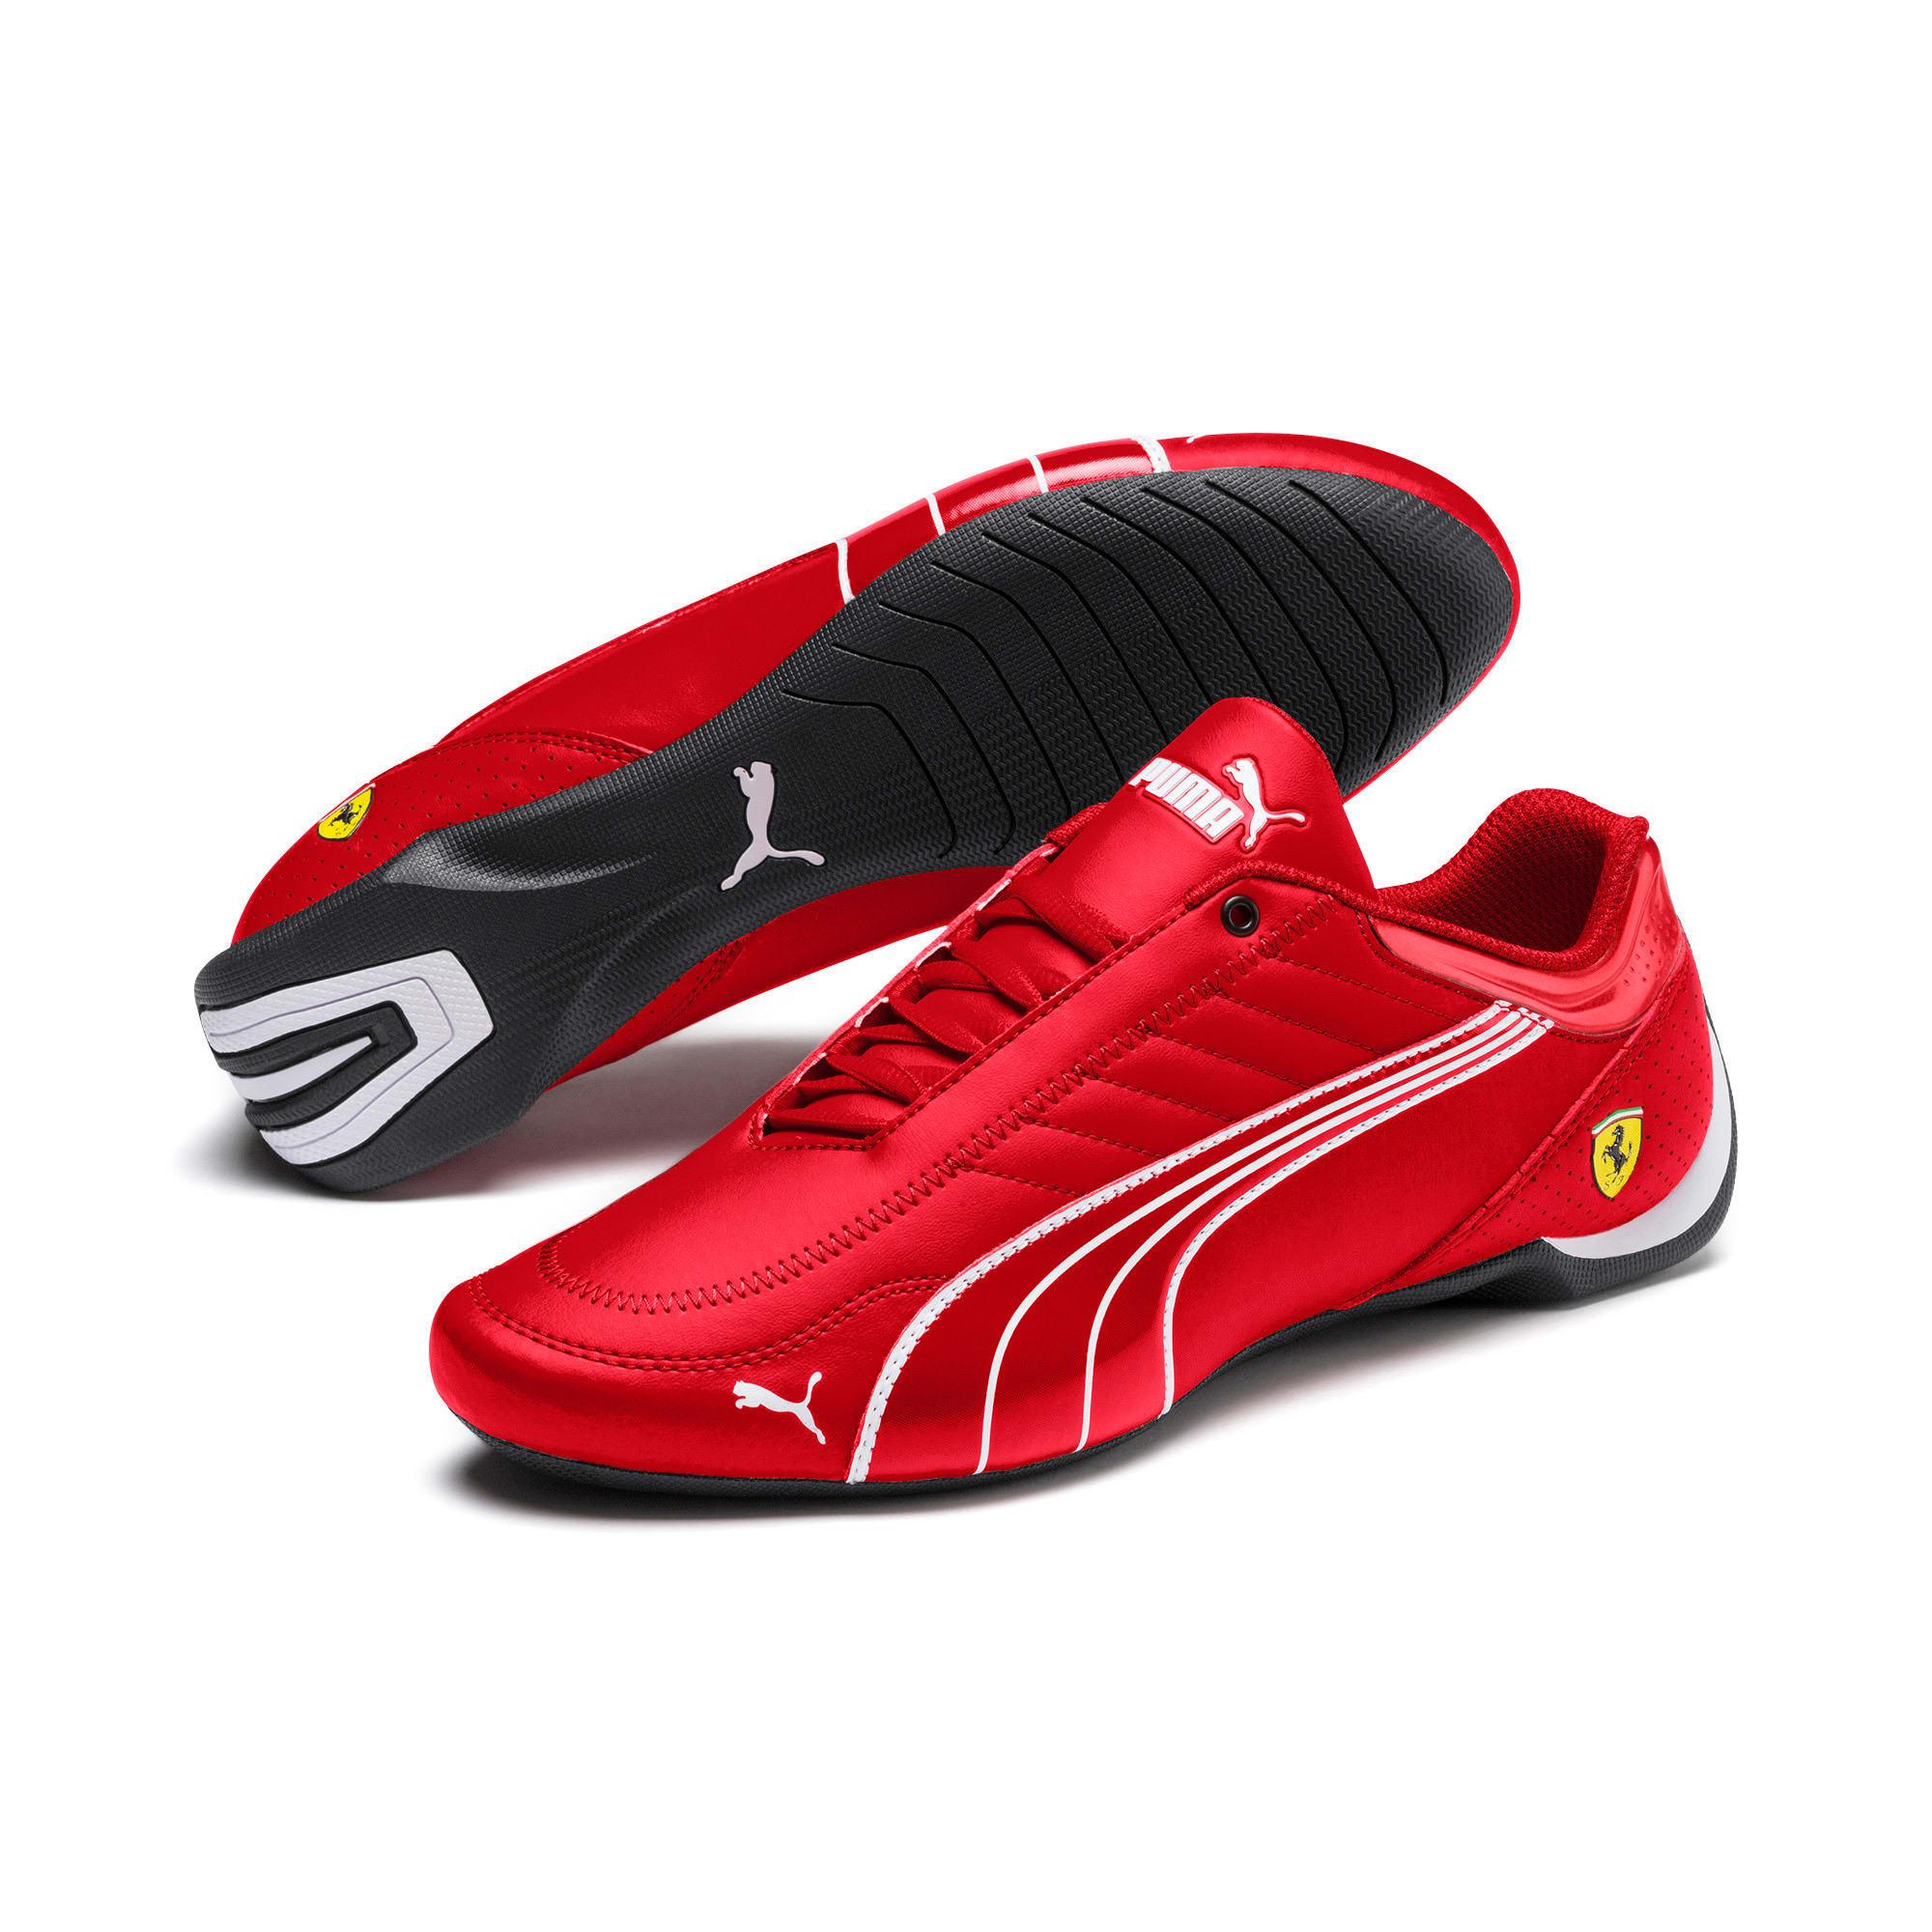 Miniatura 3 de ZapatosScuderiaFerrariFuture Kart Cat, Rosso Corsa-Puma Black, mediano